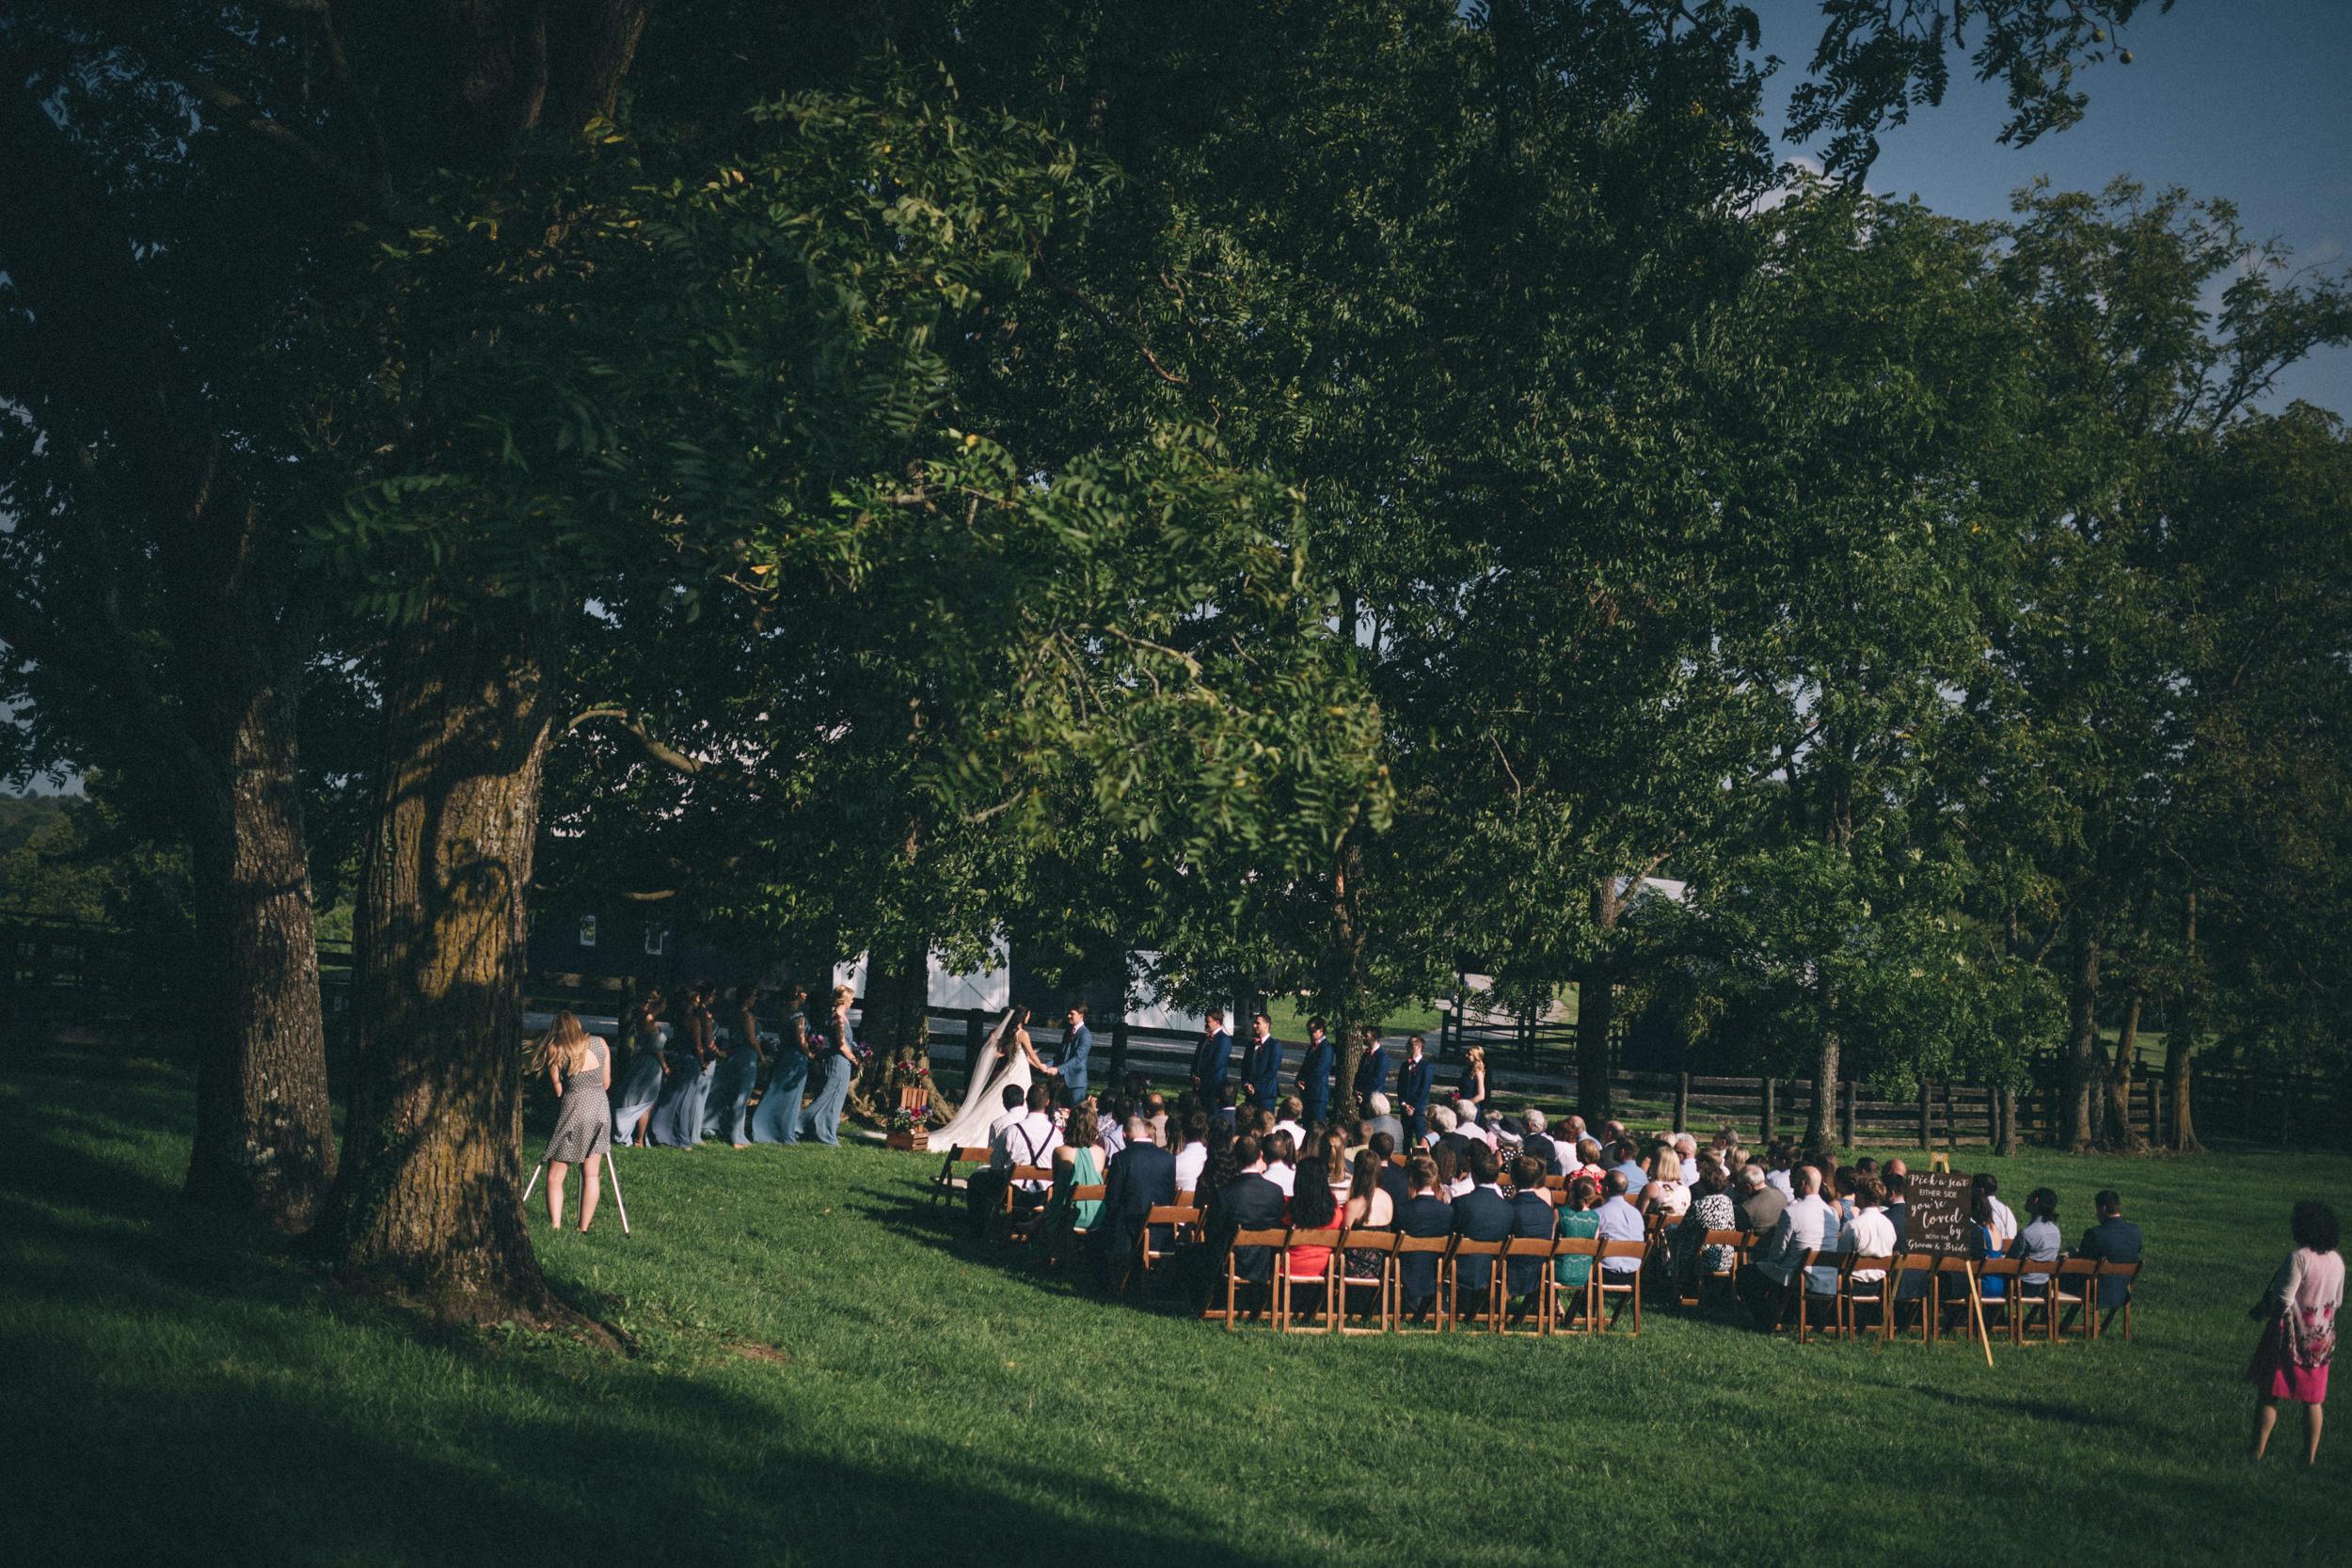 Louisville-Kentucky-Wedding-and-Elopement-Photographer-Sarah-Katherine-Davis-Photography-Summer-Jewel-Toned-Wedding-Chineese-Tea-Ceremony-Warrenwood-Manor-Danville-506.jpg